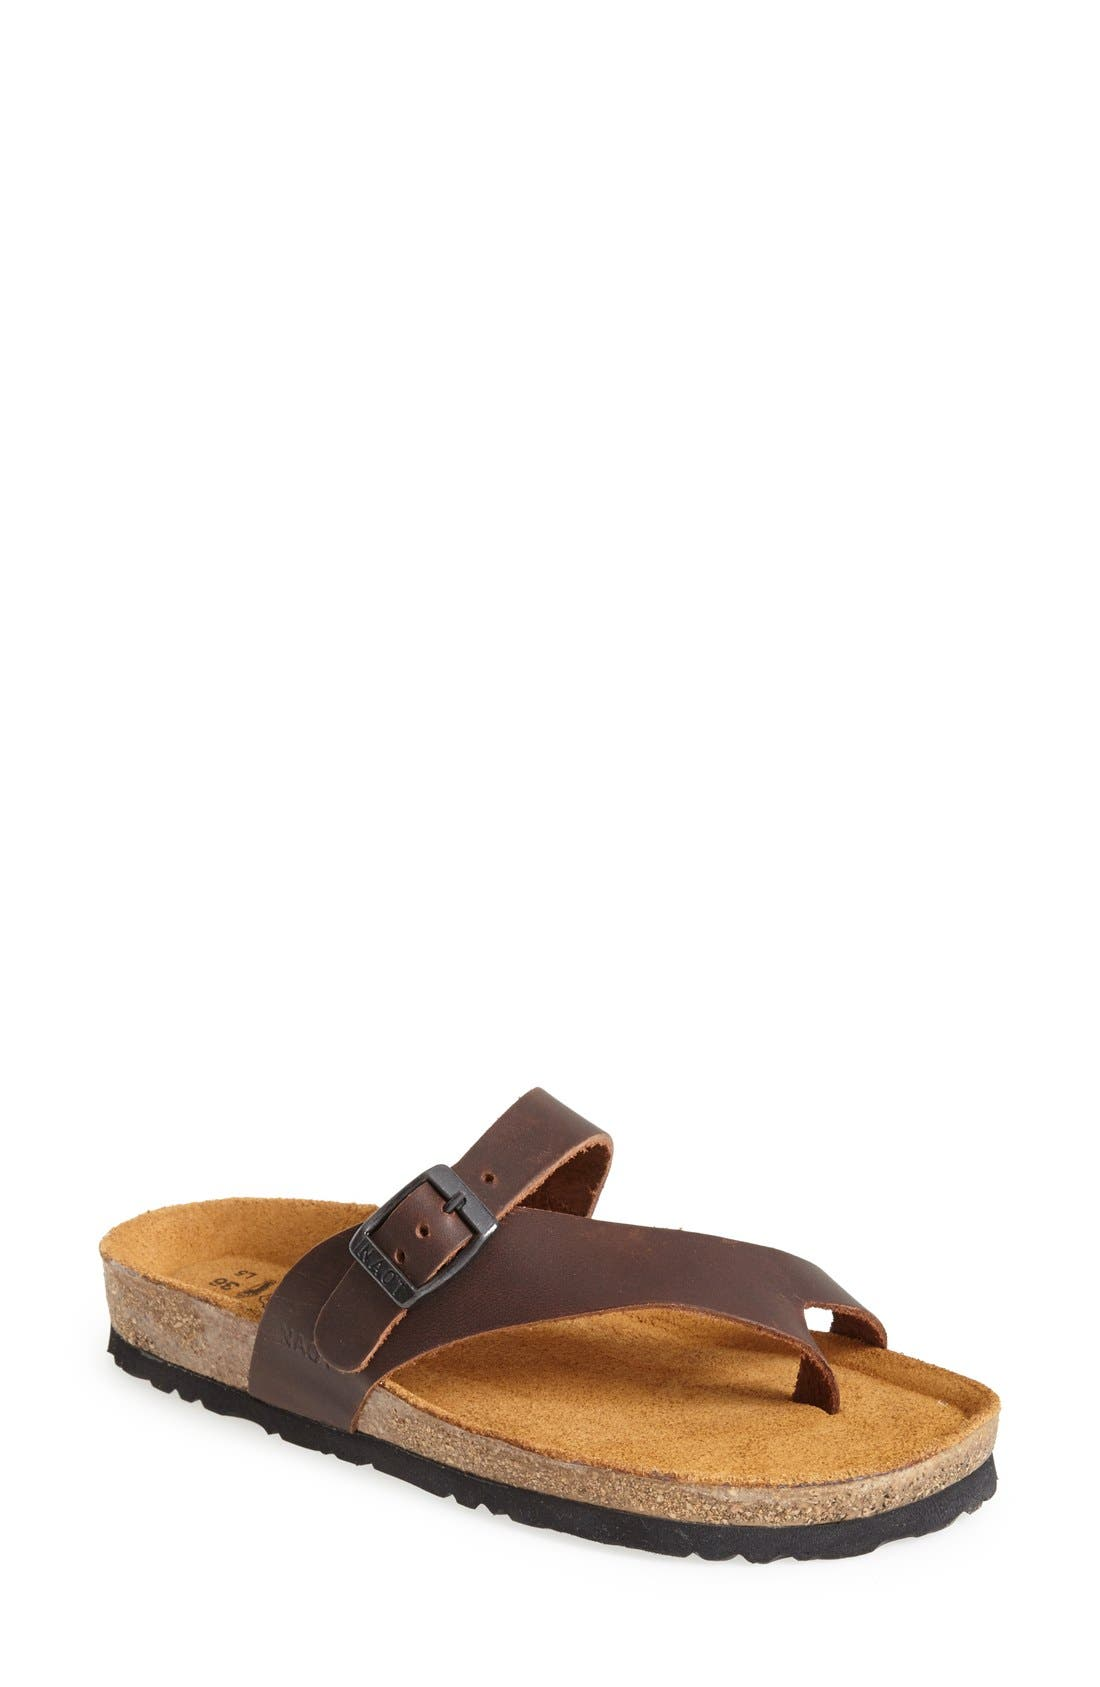 NAOT 'Tahoe' Sandal